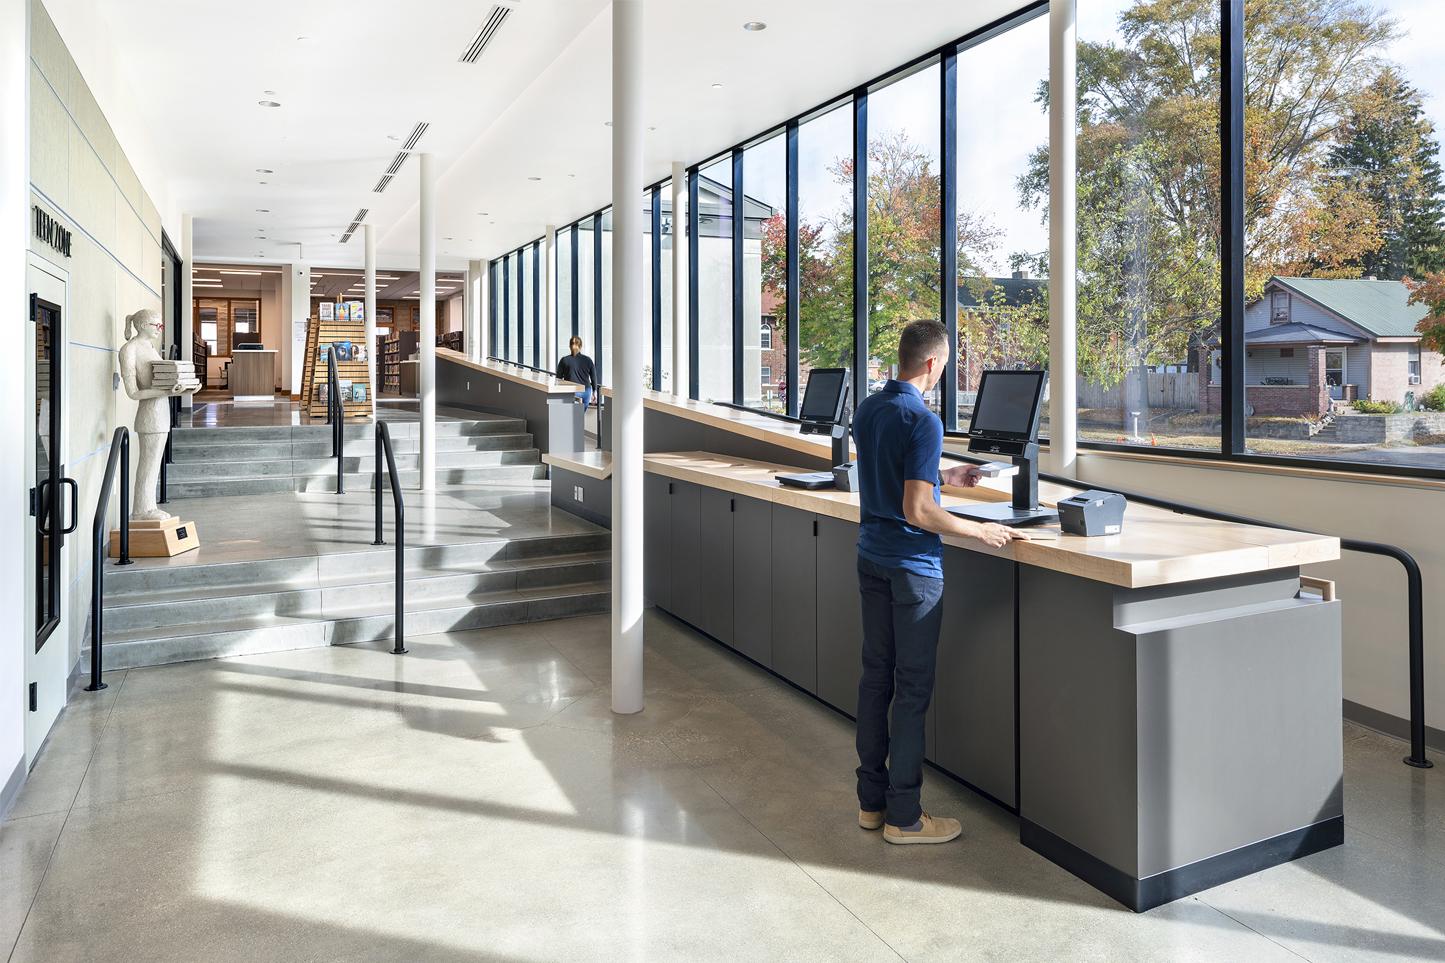 krM Architecture – Morgan County Public Library